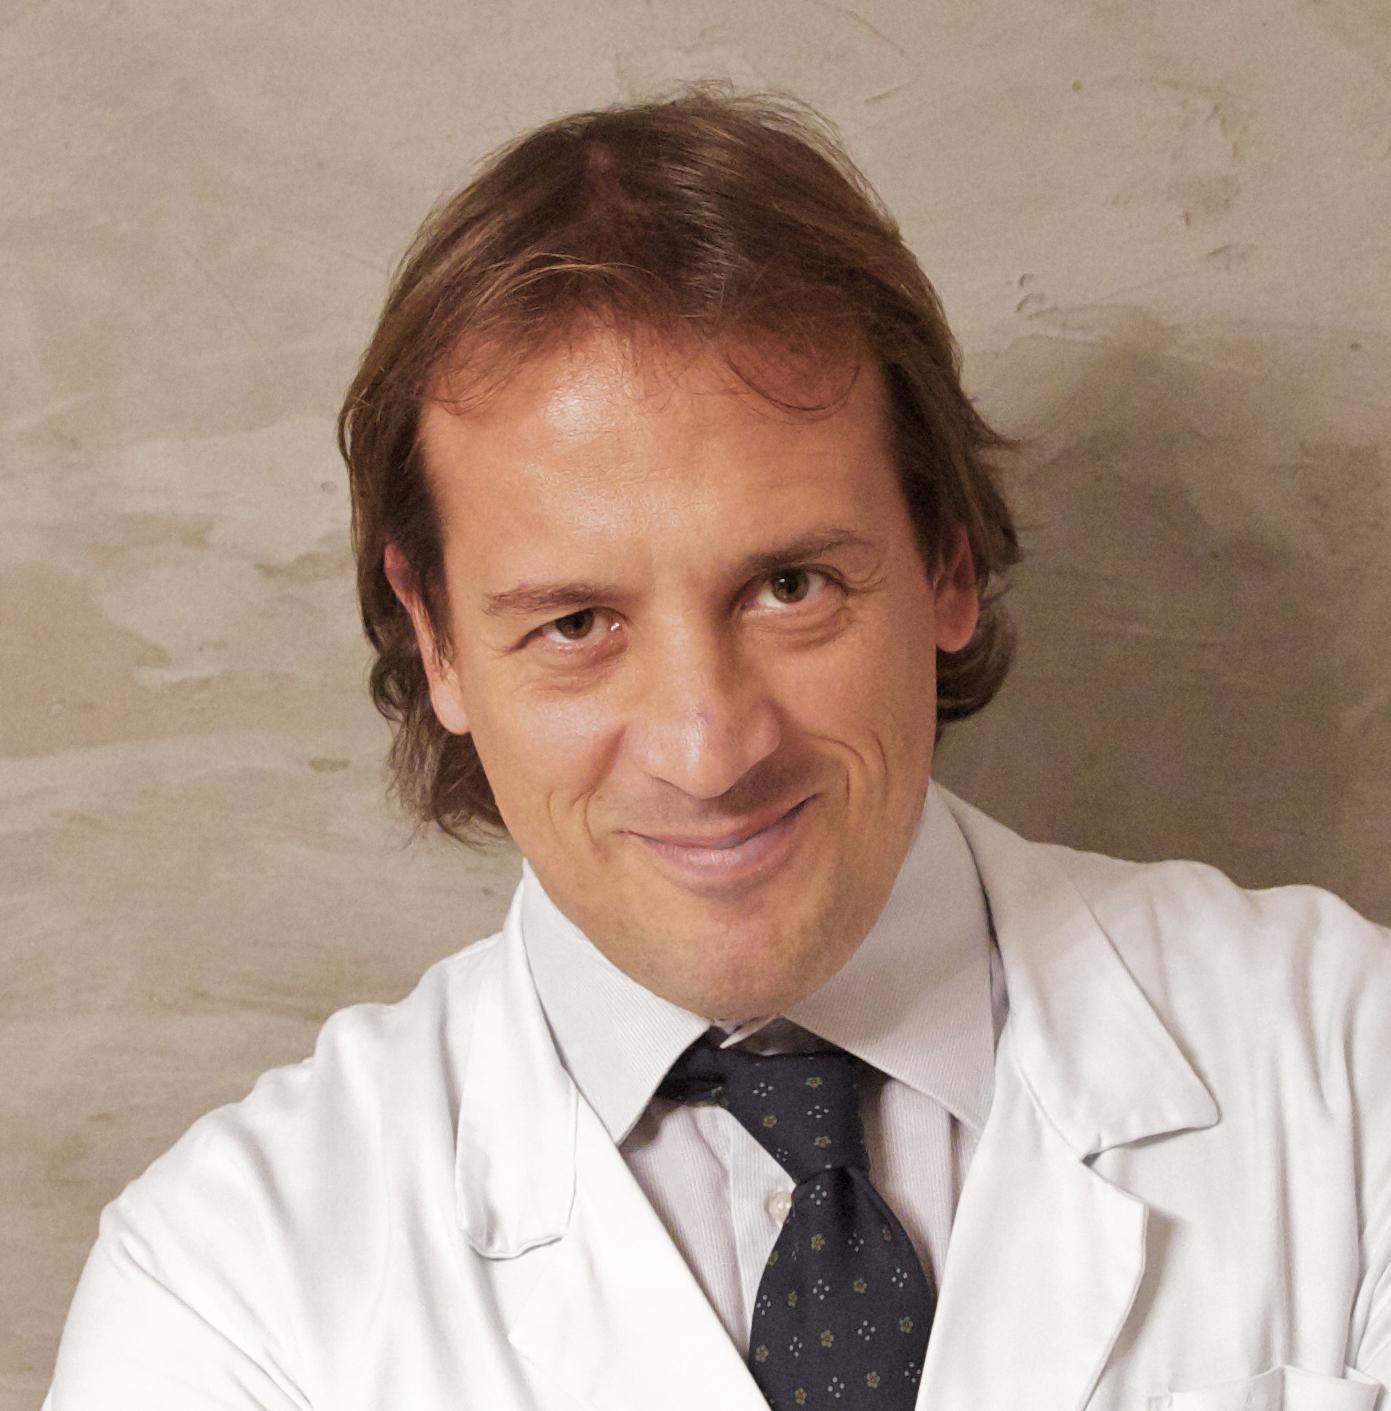 Dott. Marco Trono